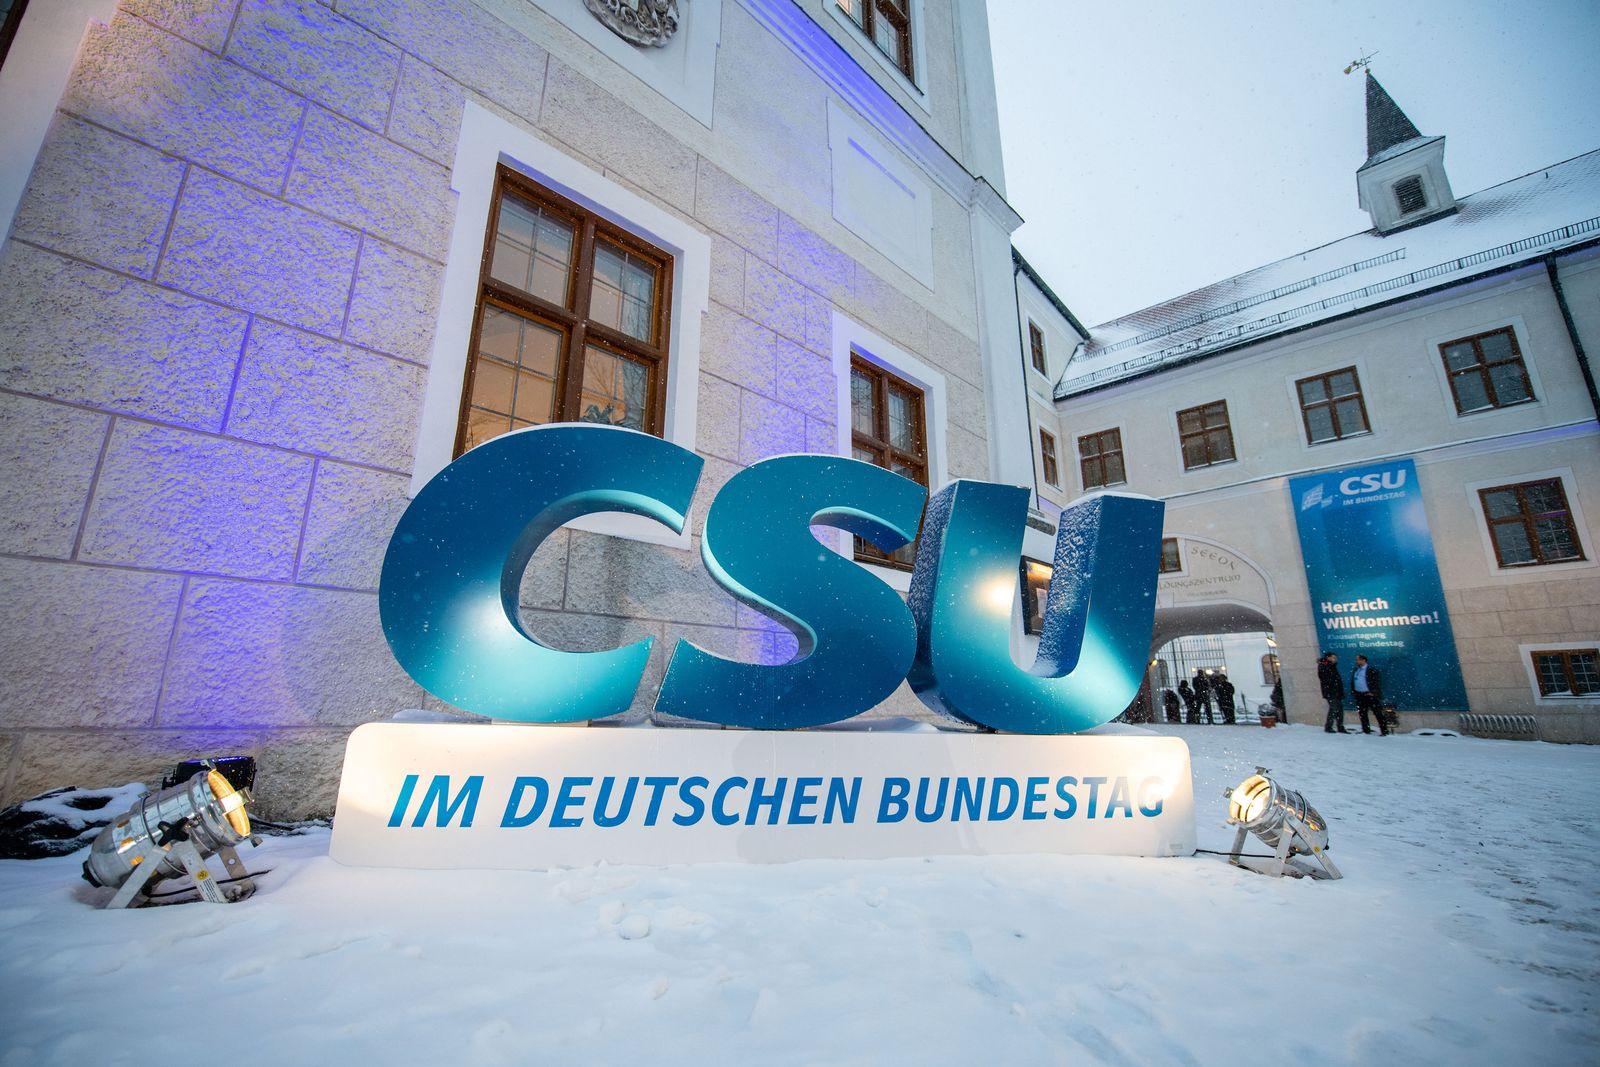 Winterklausur/ CSU-Landesgruppe/ Seeon